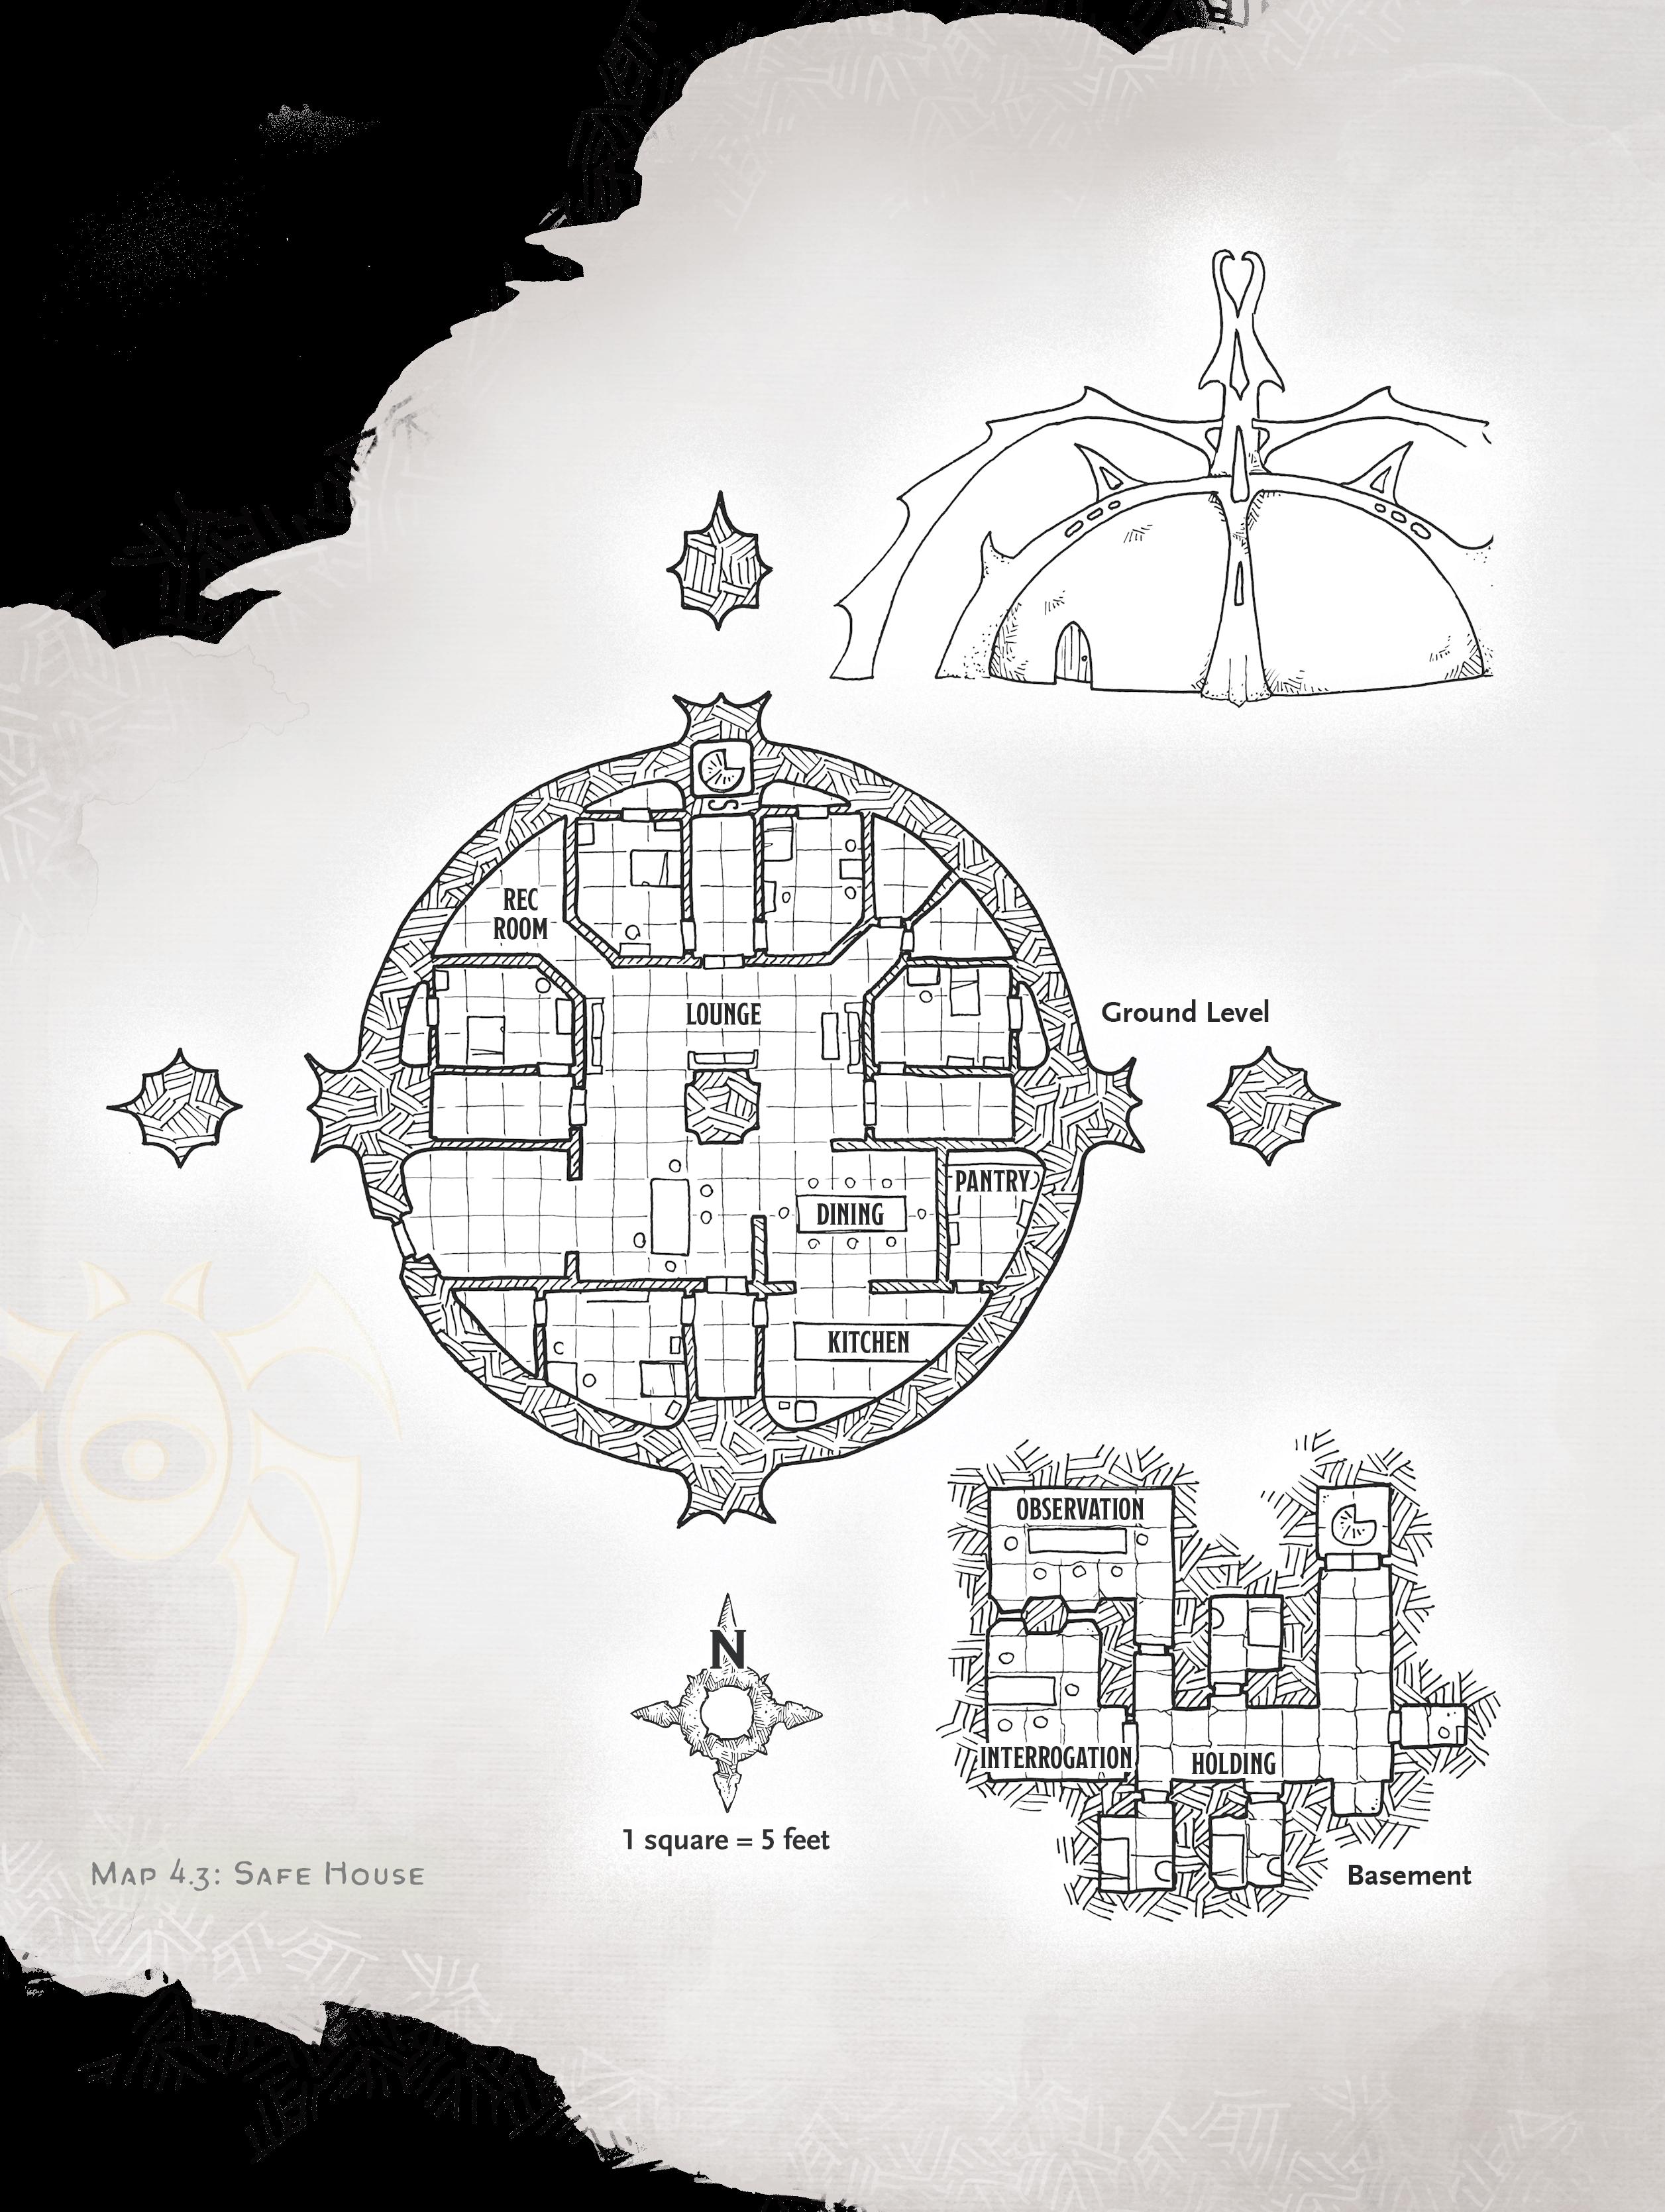 safe house map